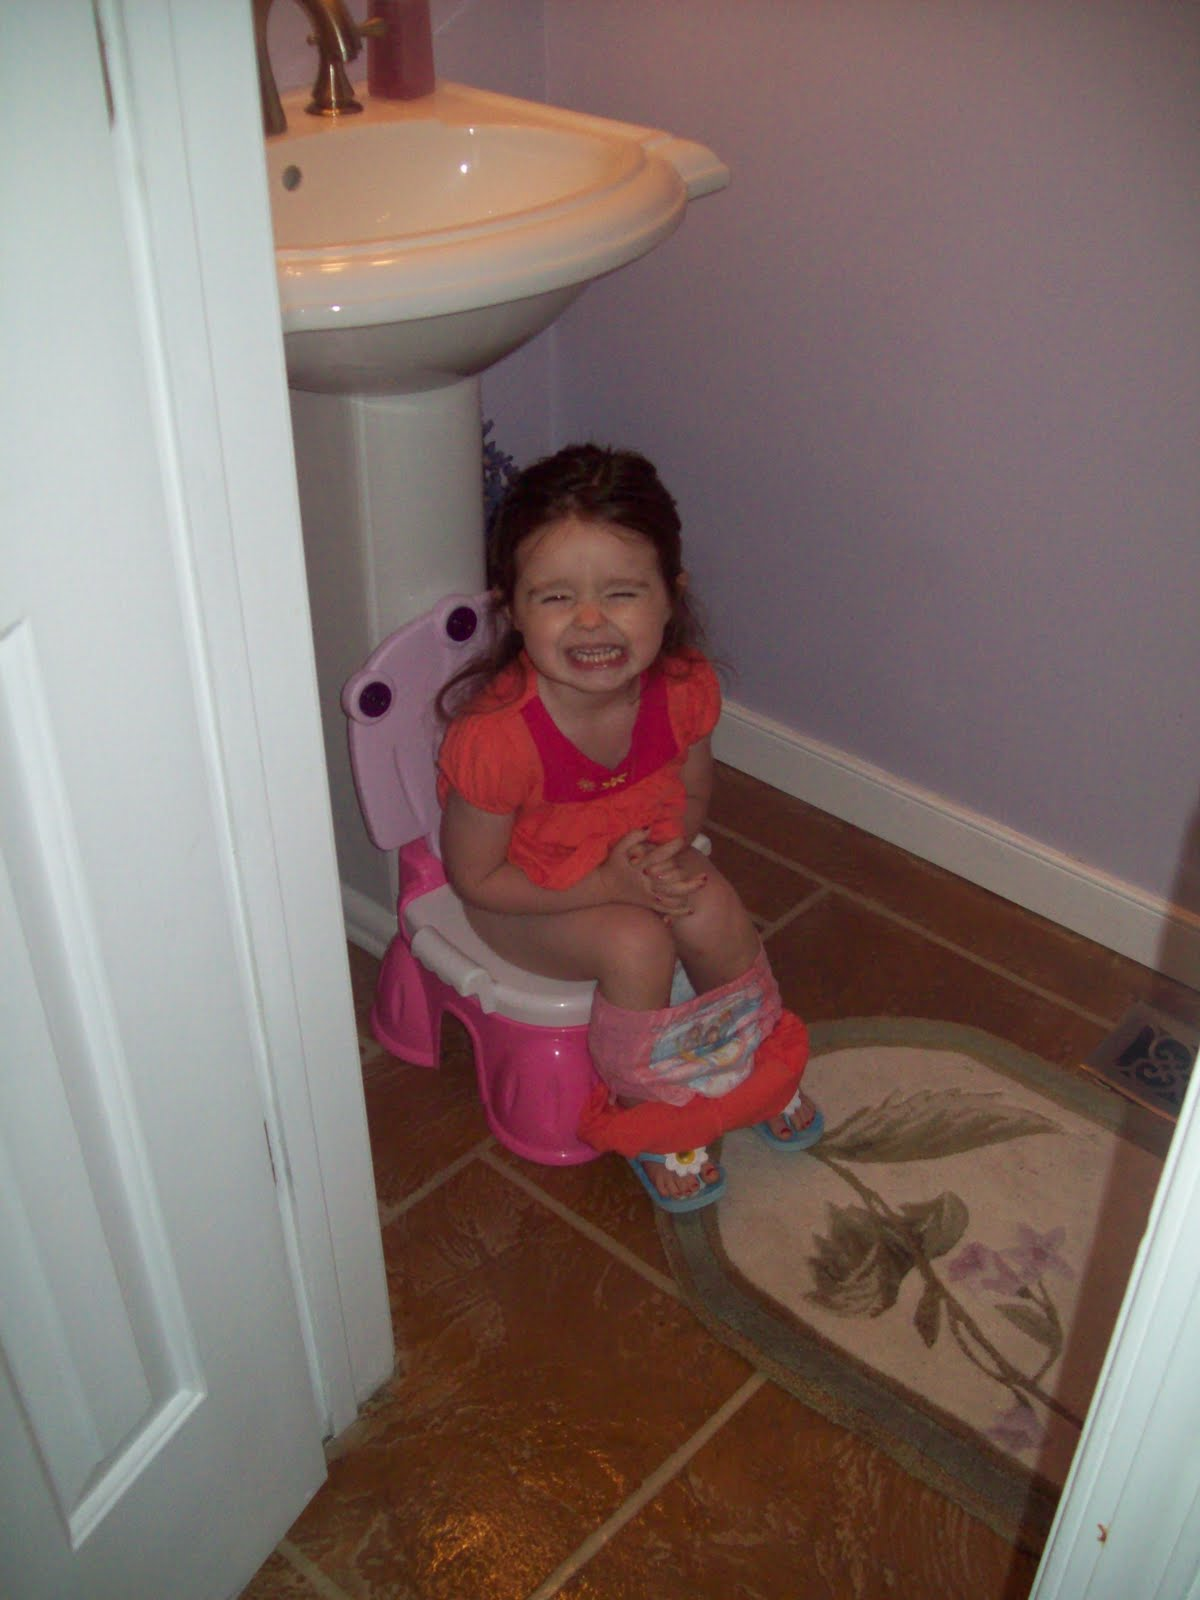 naked-girl-pooping-on-a-boy-inside-the-shower